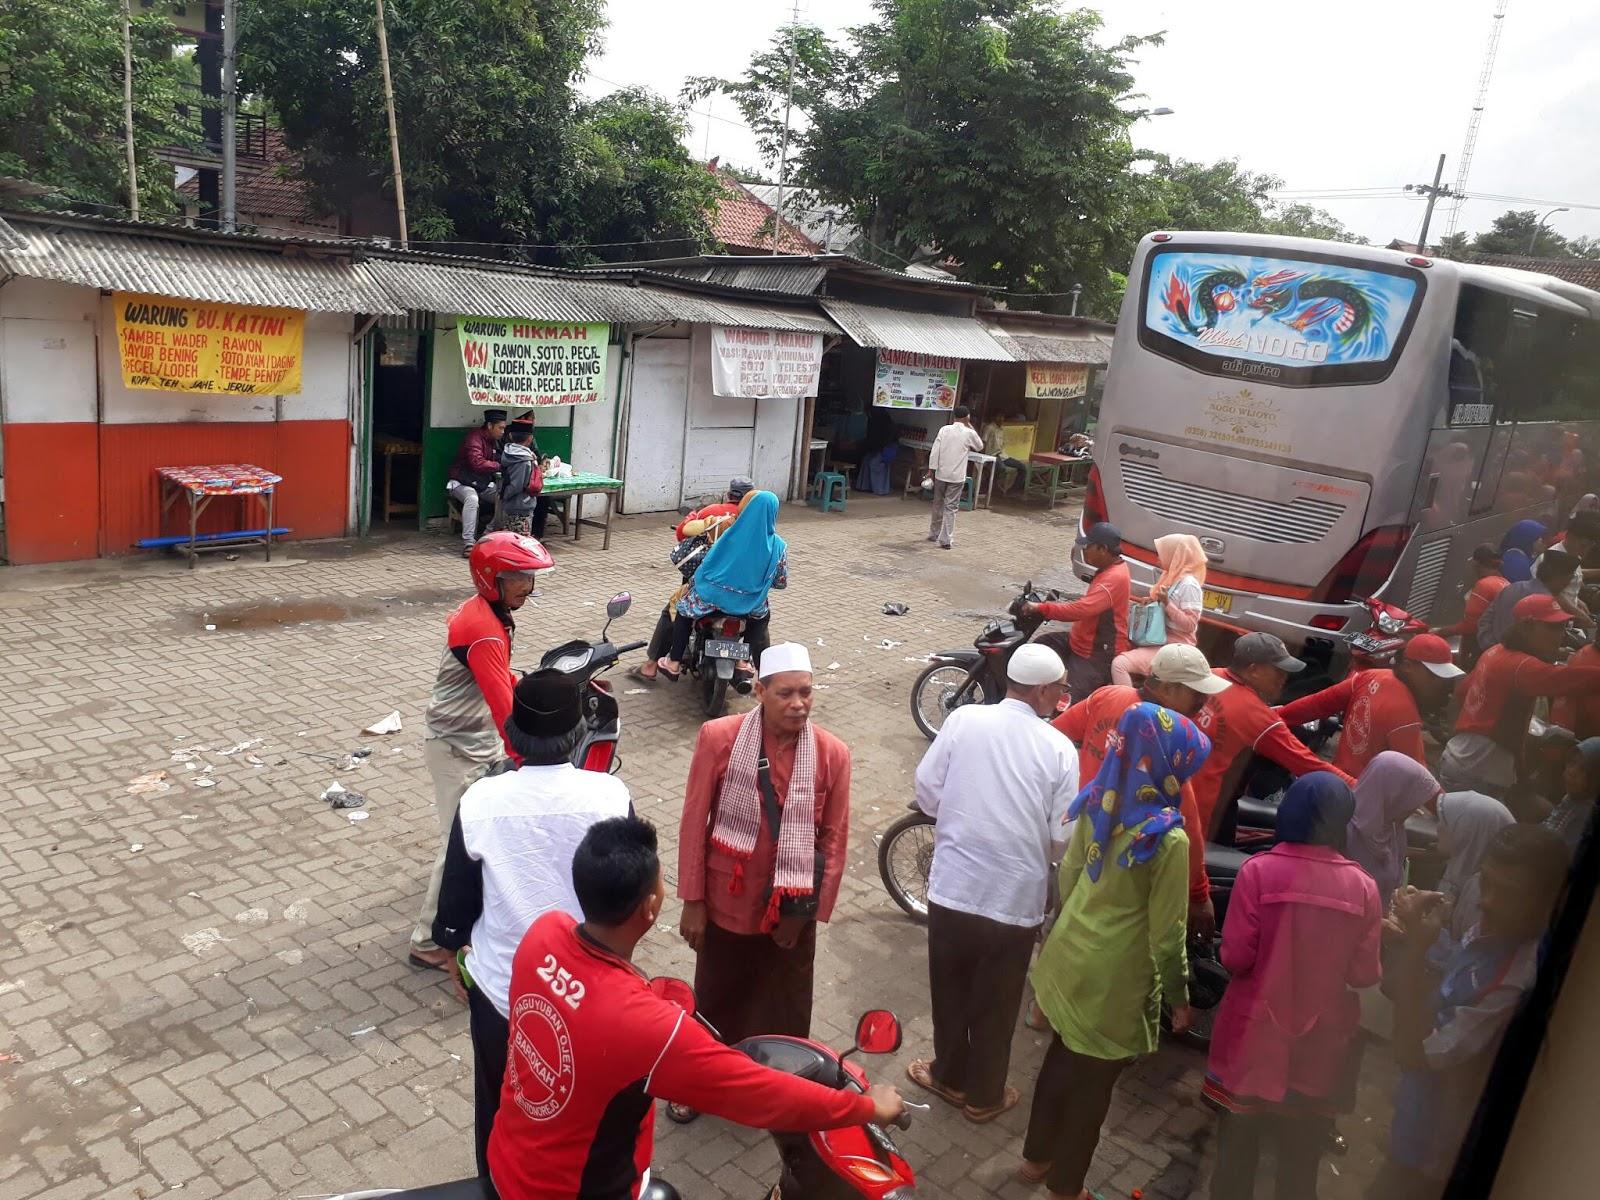 Makam Troloyo Mojokerto Jasa Ojek Parkiran Bus Menuju Cukup Kab